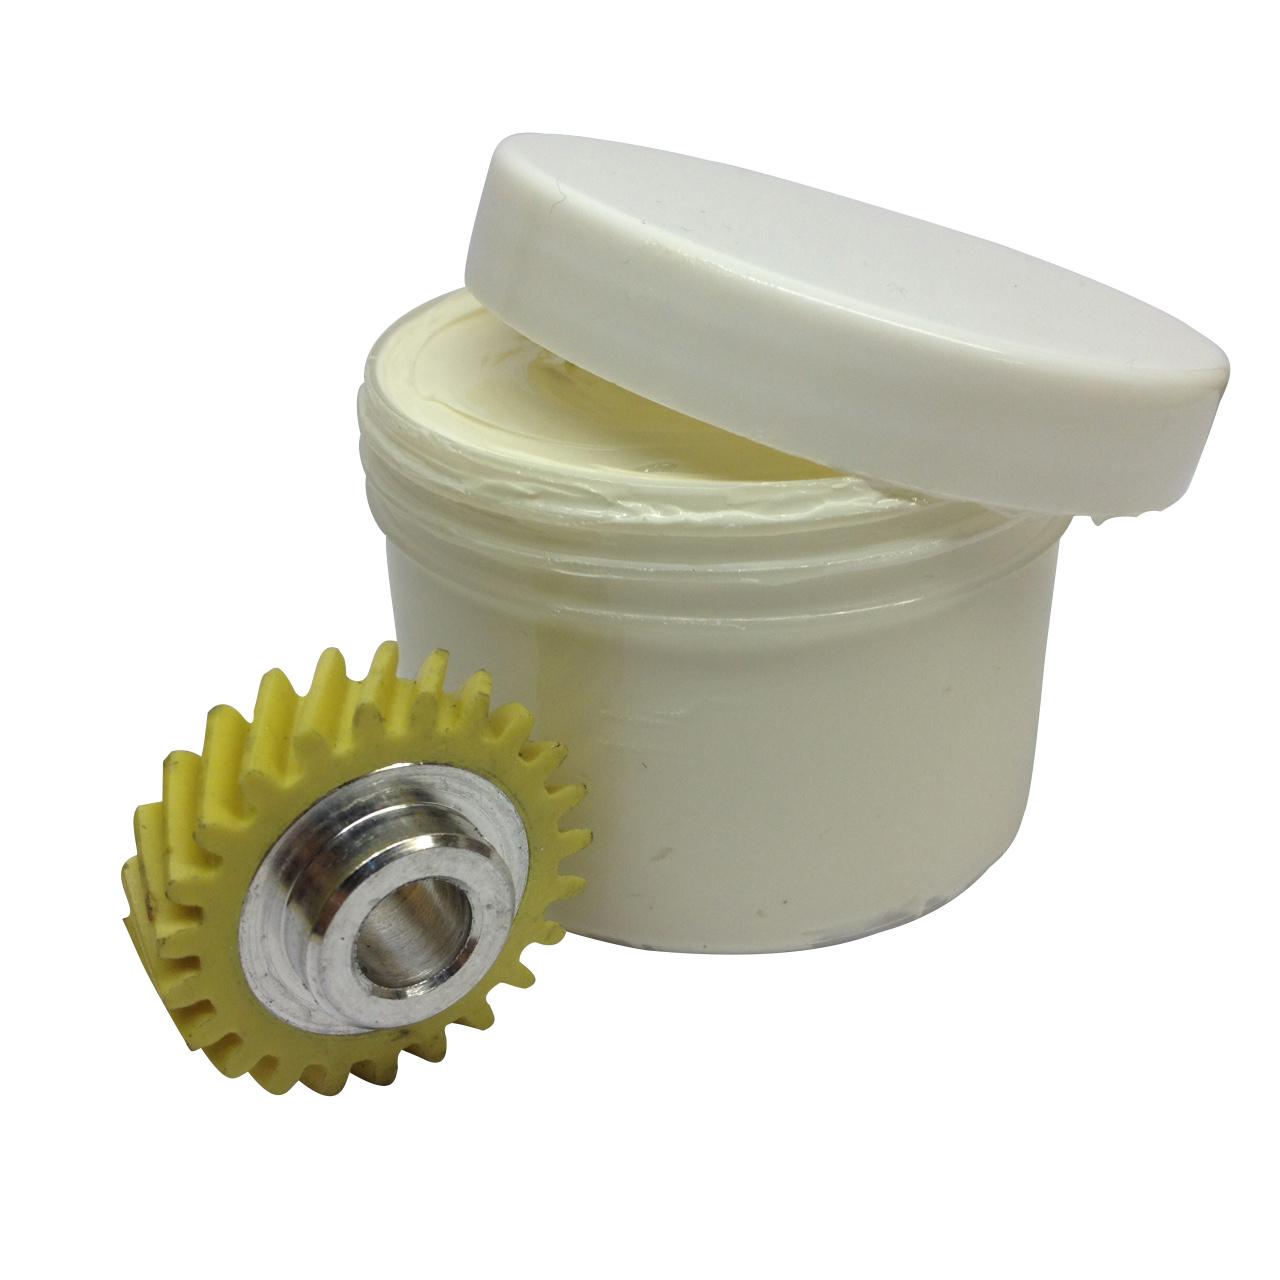 Kitchenaid worm pinion gear w10112253 100g of foodsafe grease lana 39 s kenwood kitchenaid spares - Food grade grease kitchenaid ...